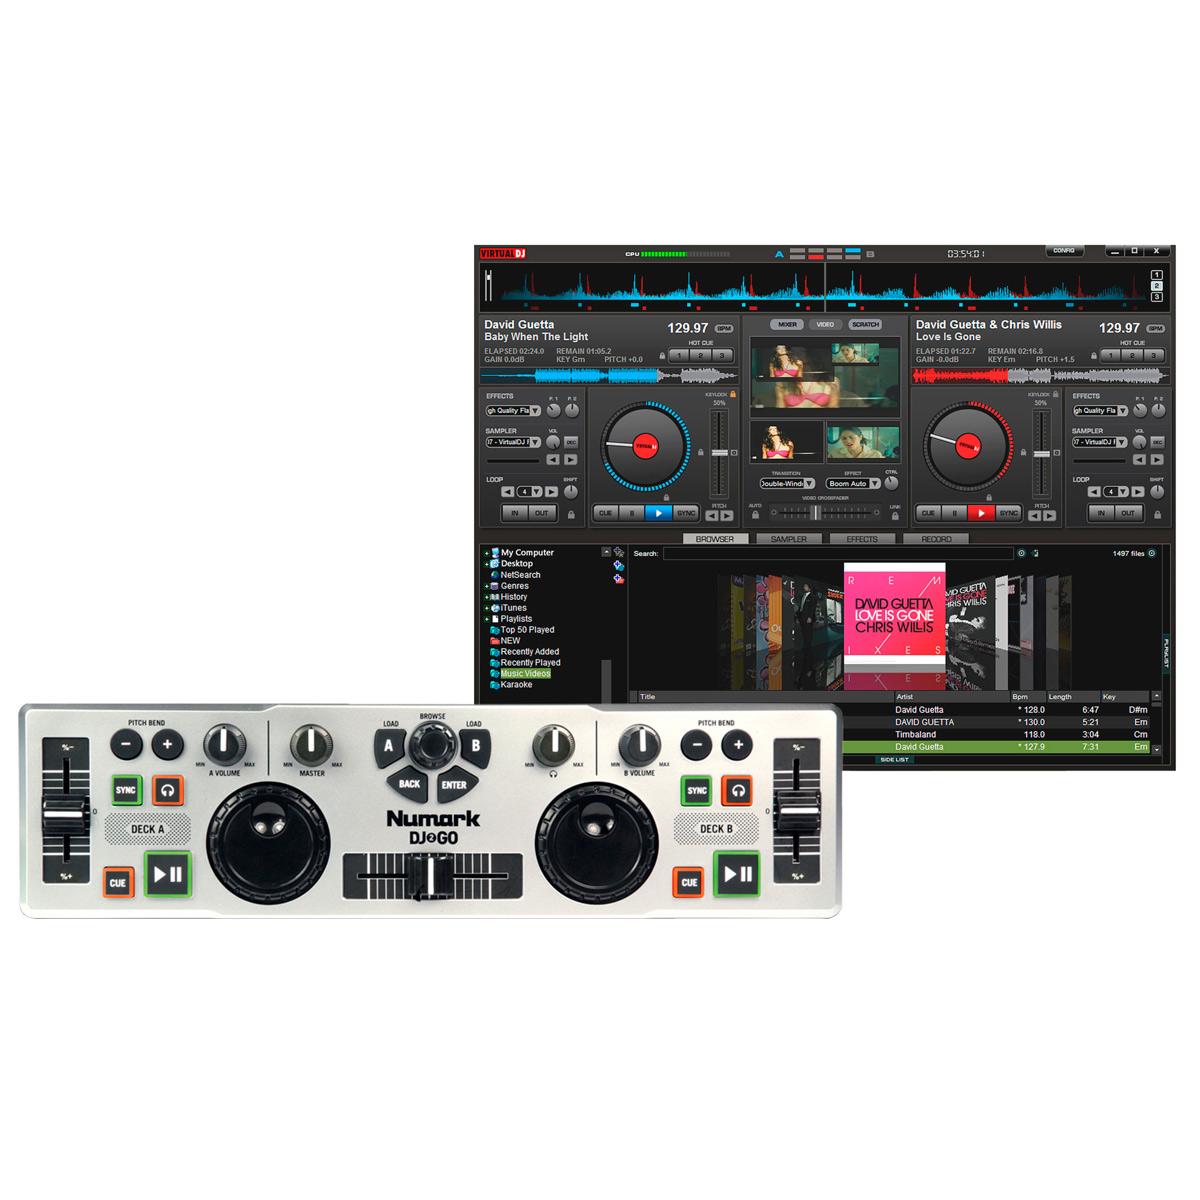 DJ2GO - Controladora Midi USB DJ 2 GO - Numark